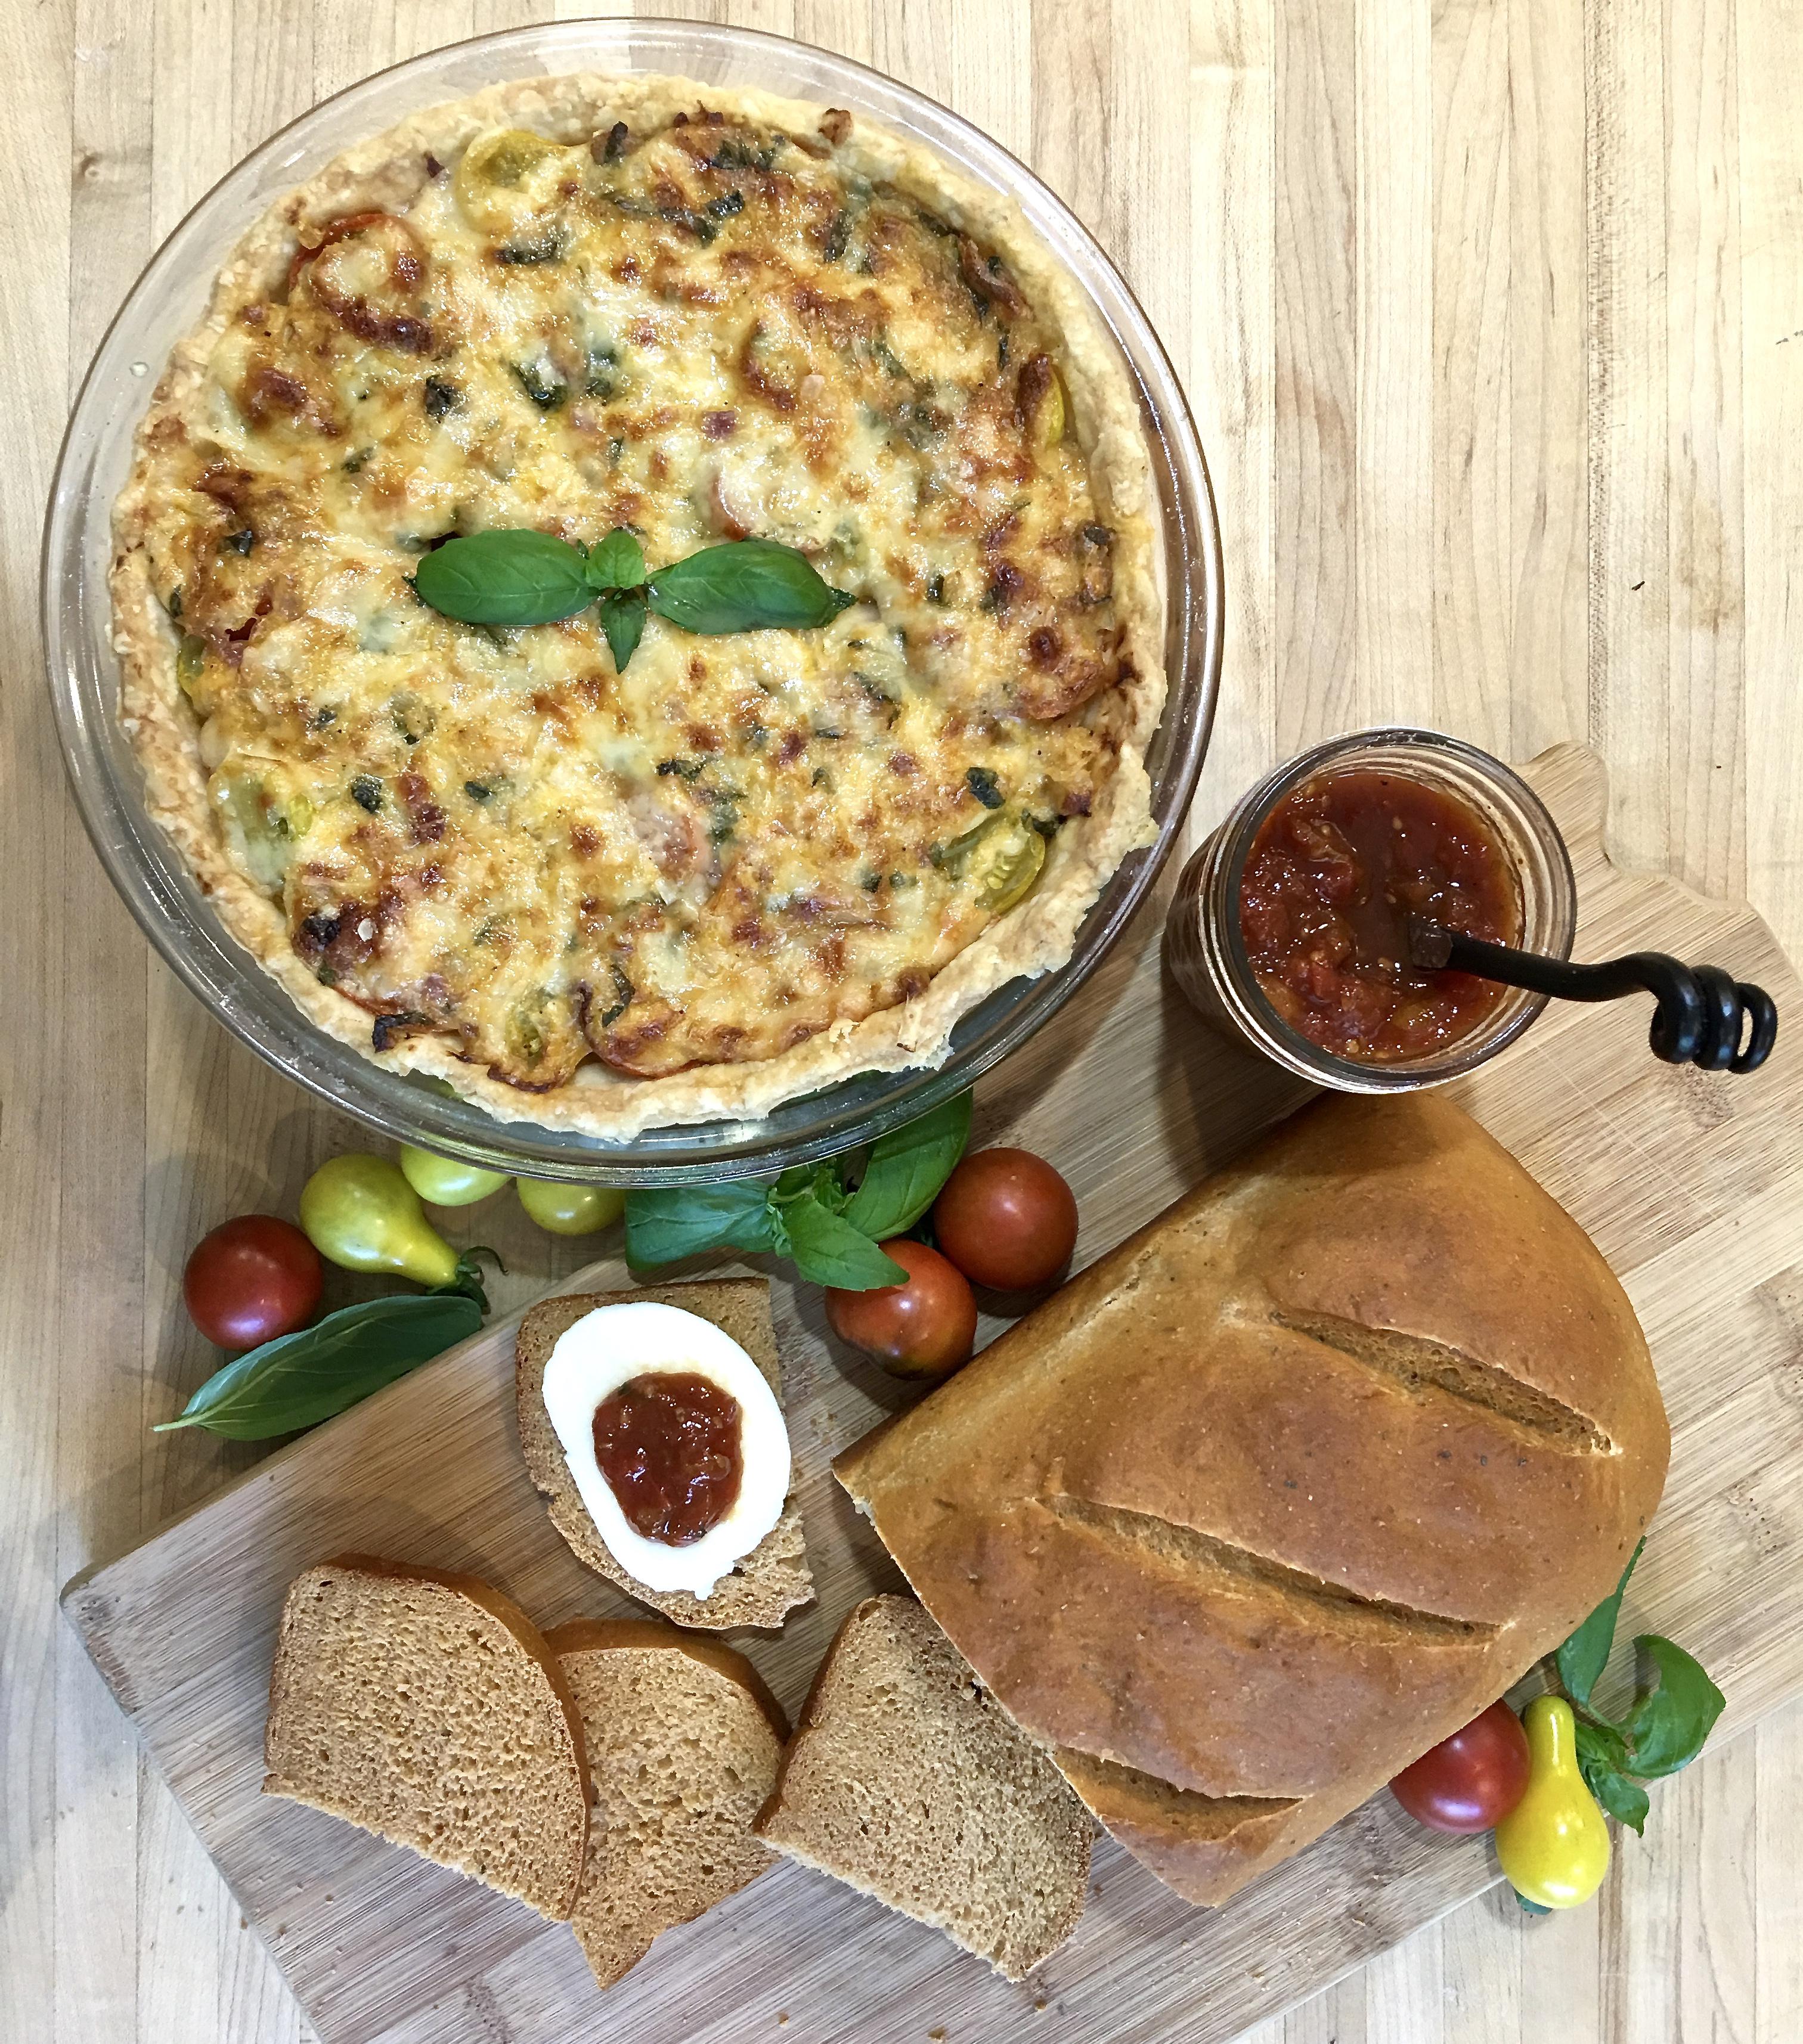 tomato pie, tomato jam and tomato bread